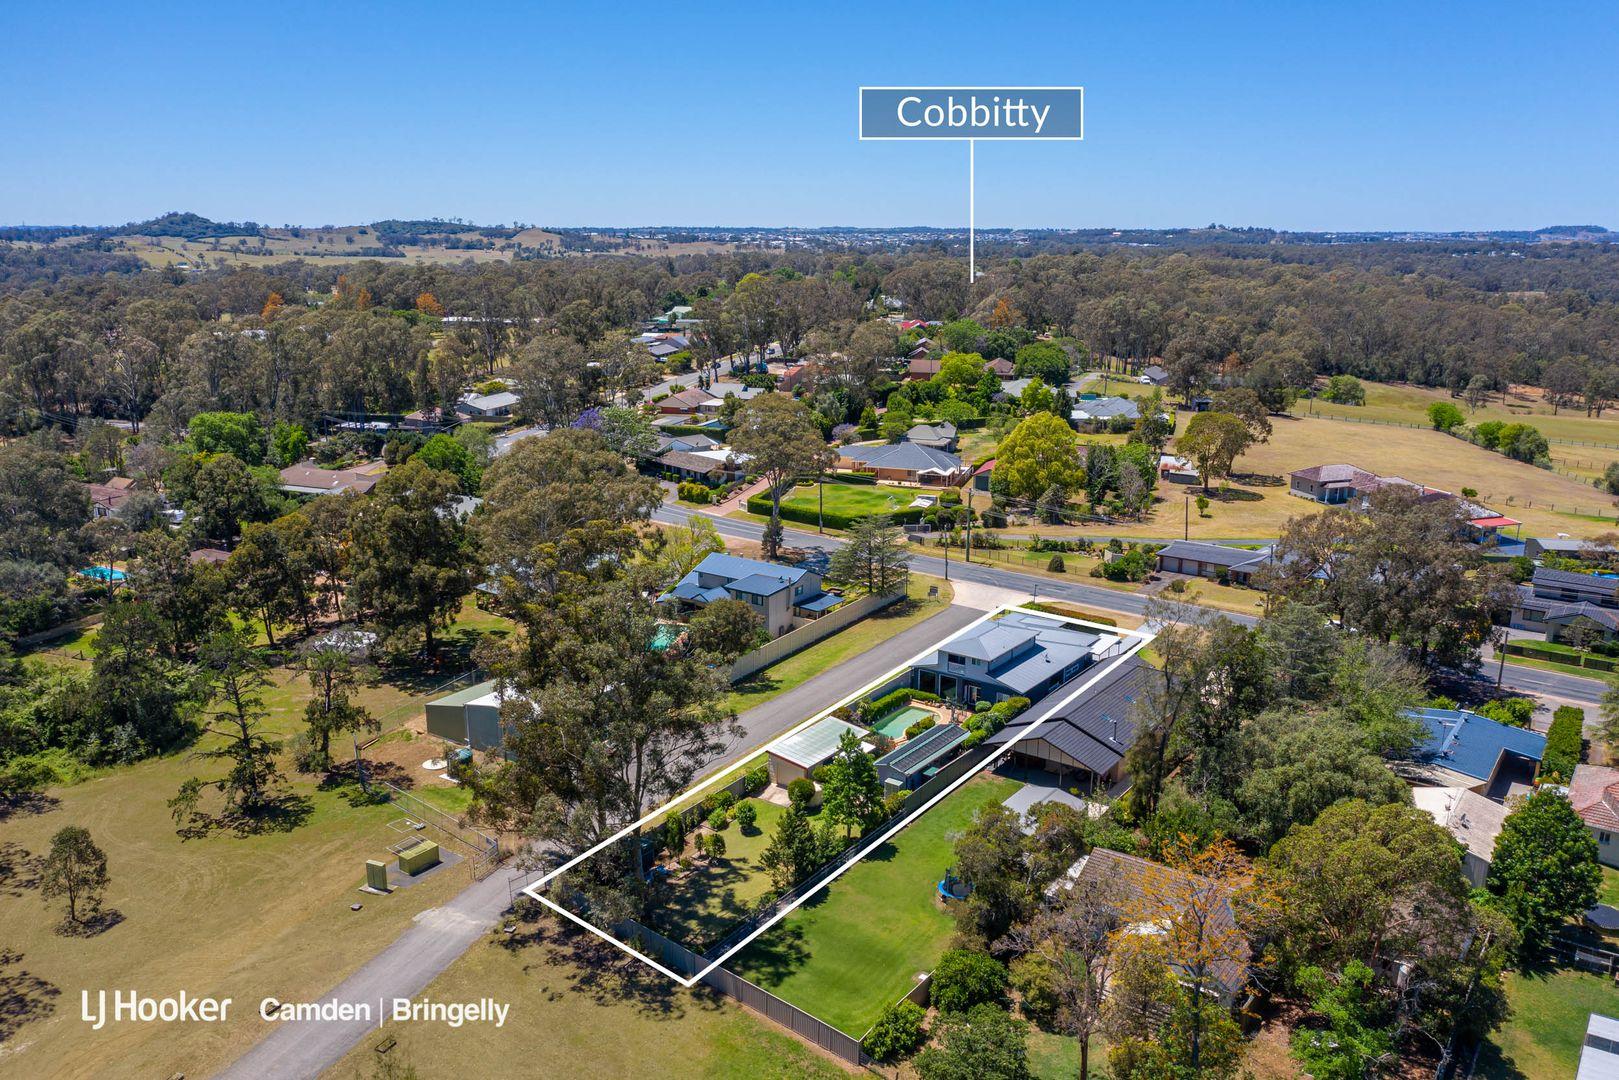 217 Cobbitty Road, Cobbitty NSW 2570, Image 0